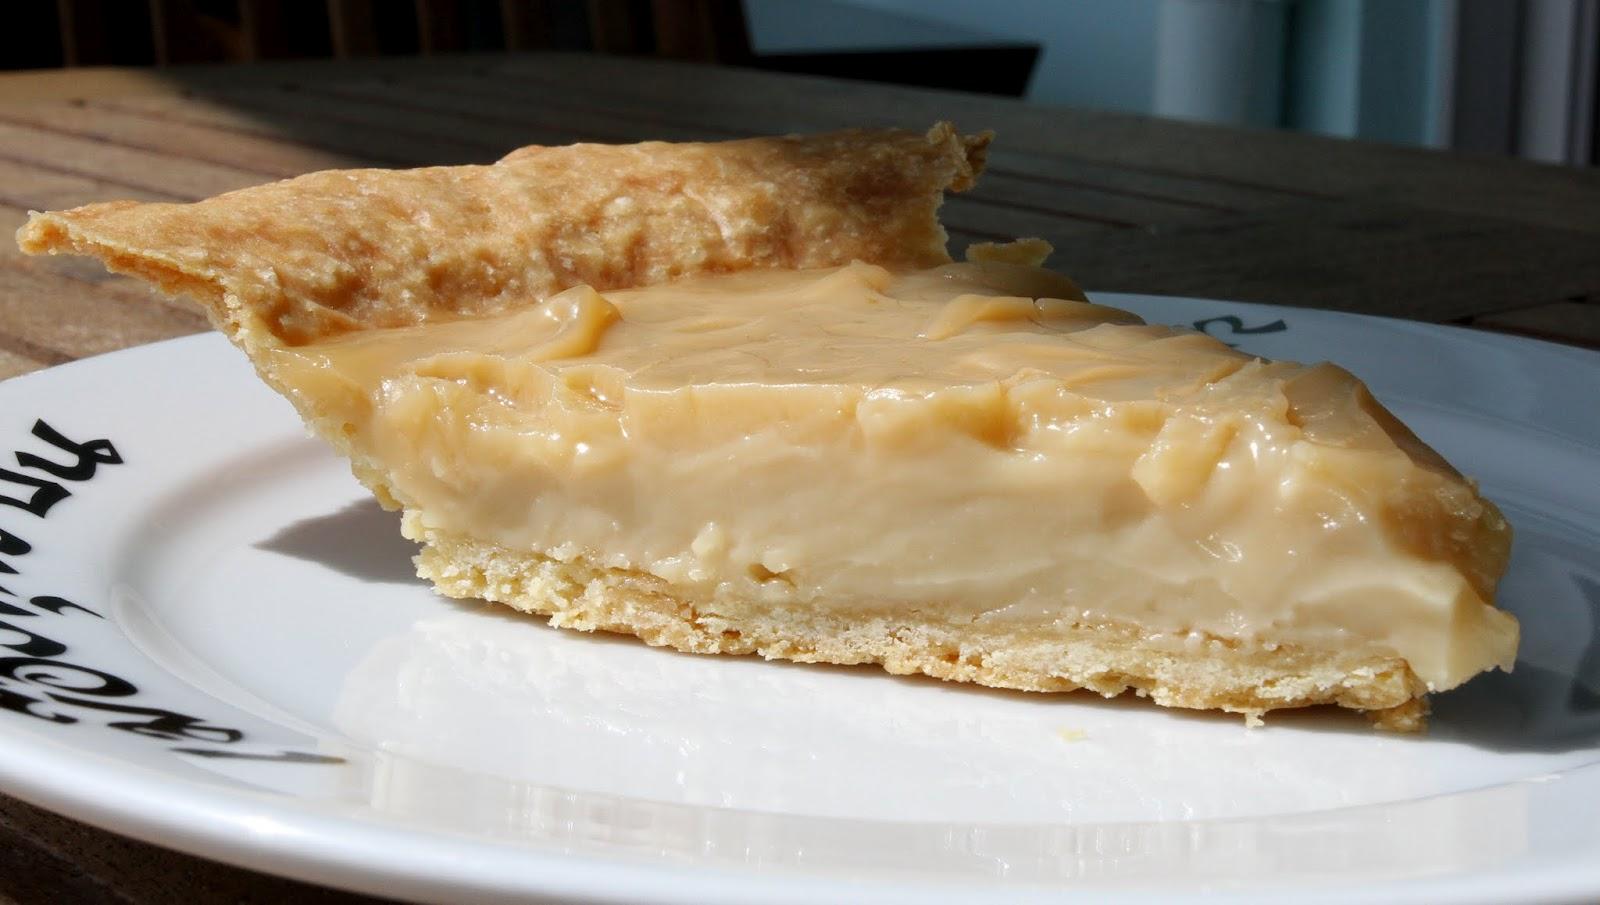 pepsakoy: Maple Syrup Pie